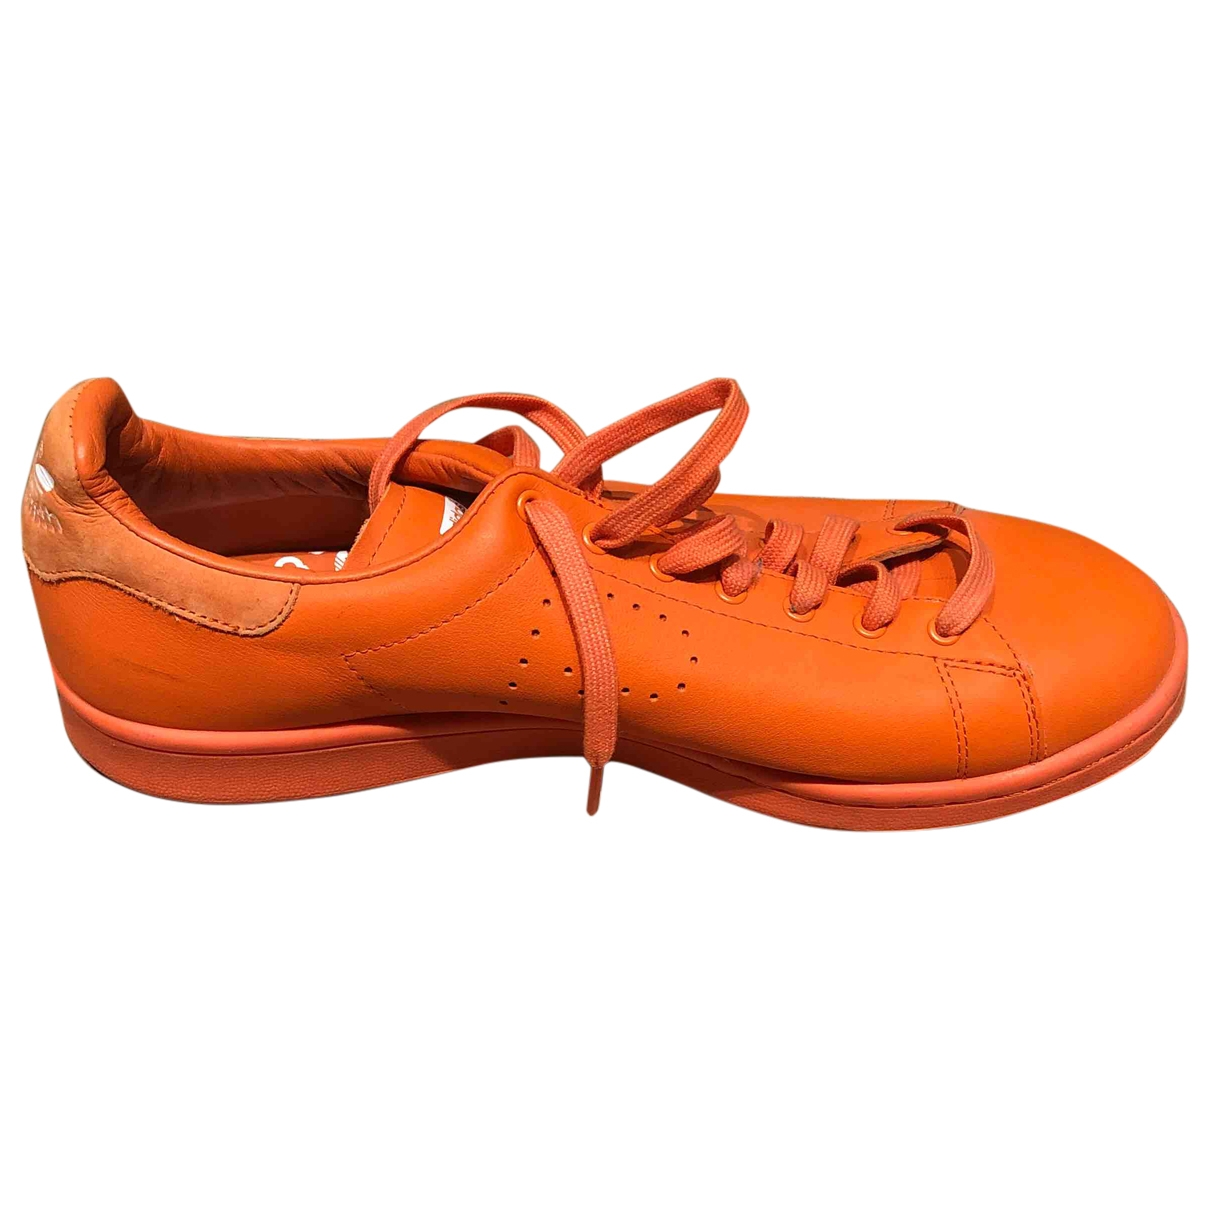 Adidas X Raf Simons - Baskets Stan Smith pour homme en cuir - orange